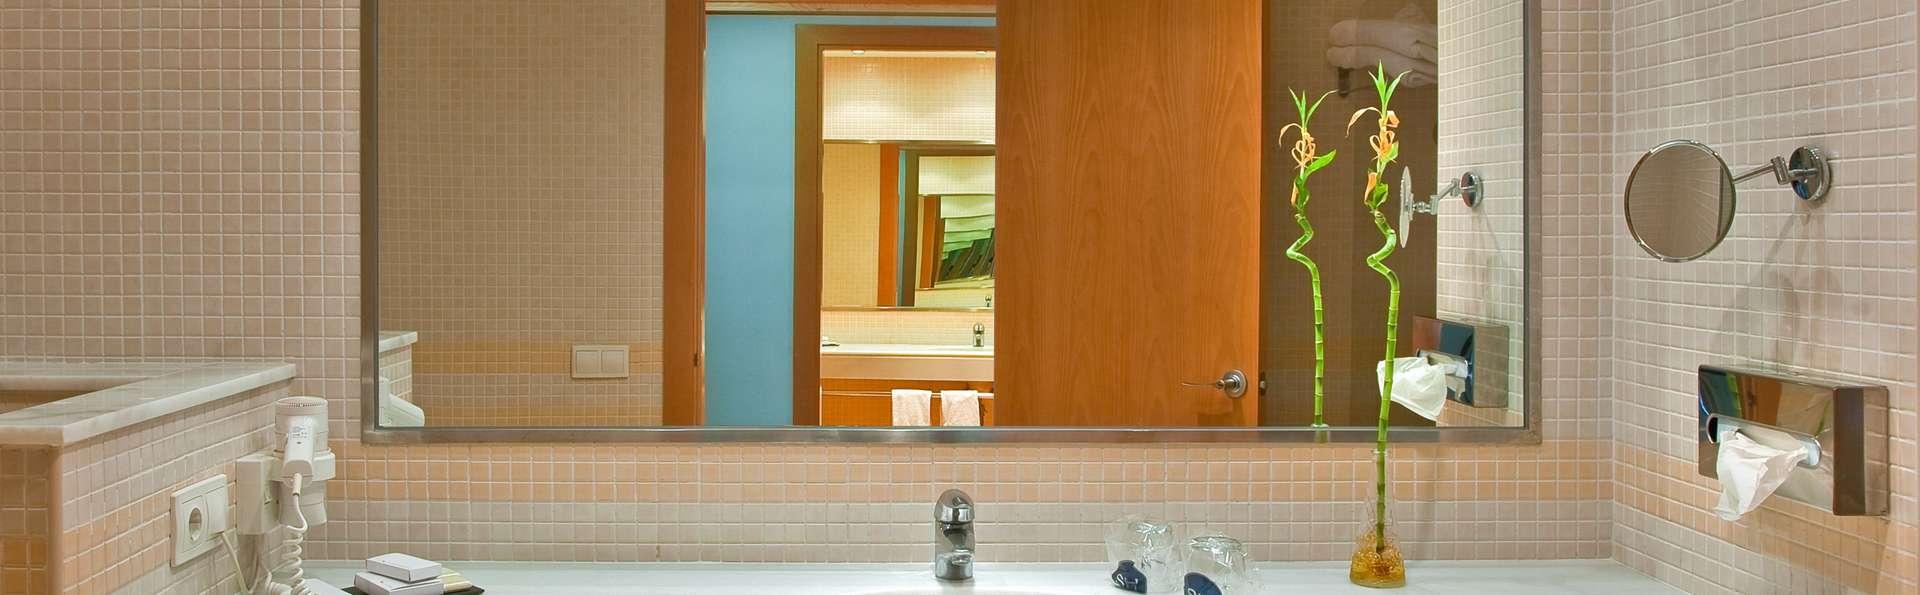 Hotel SH IFACH - habitaciones_sh_ifach_multi_25198.jpg